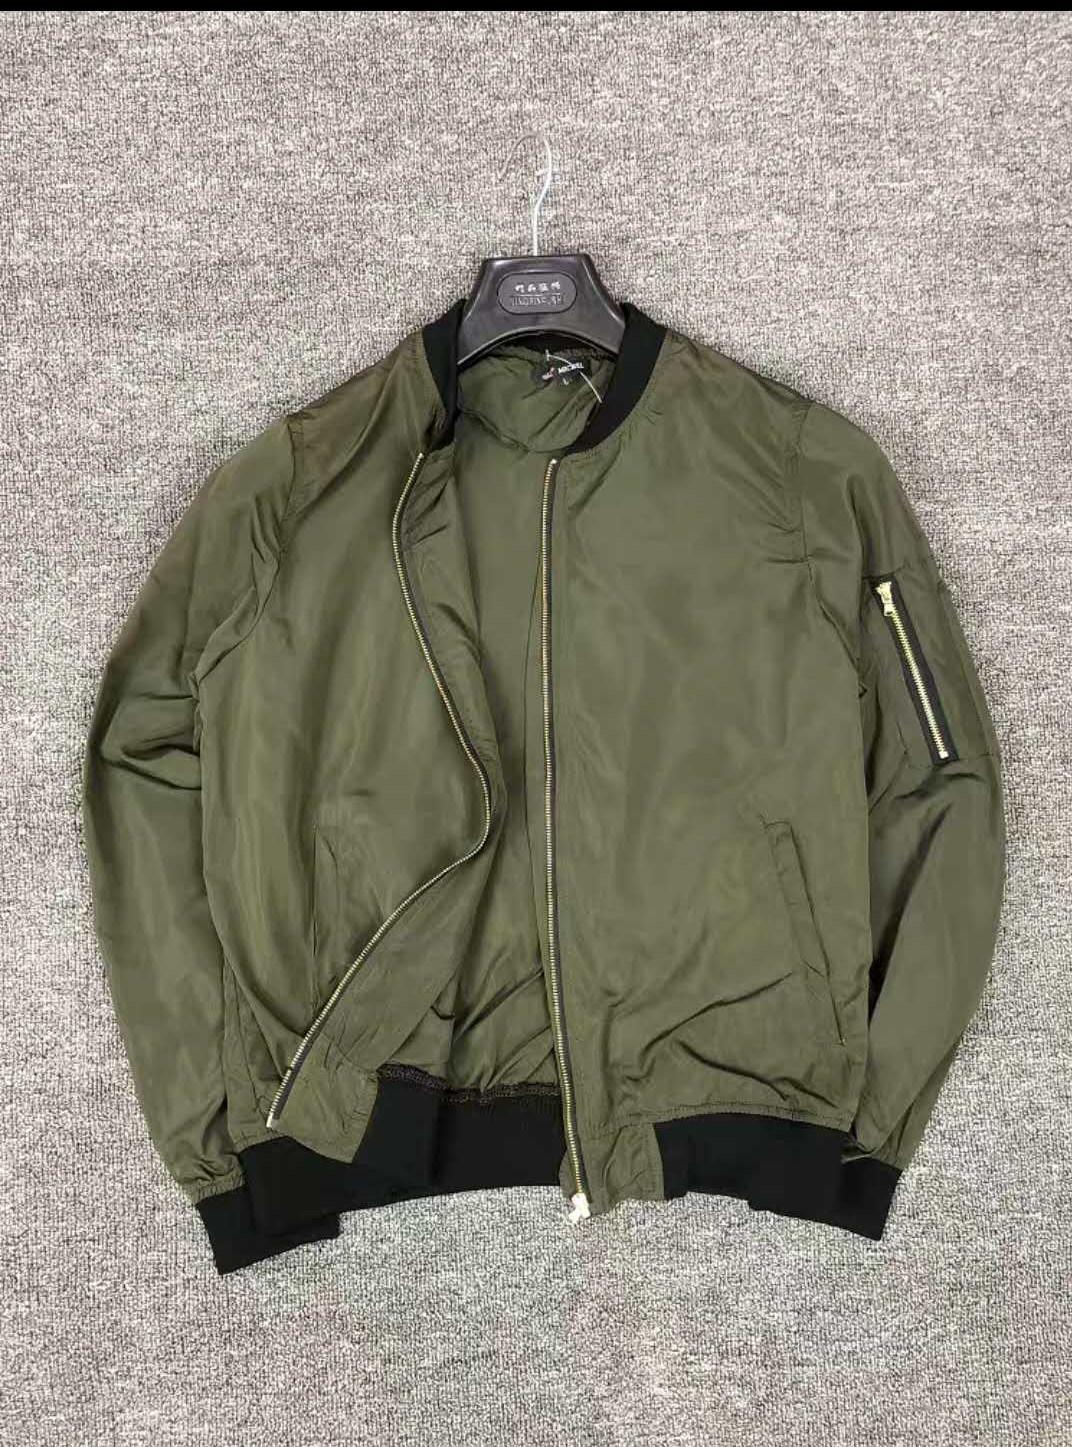 099f55ca3 Mules Molls Spring new bomer jacket